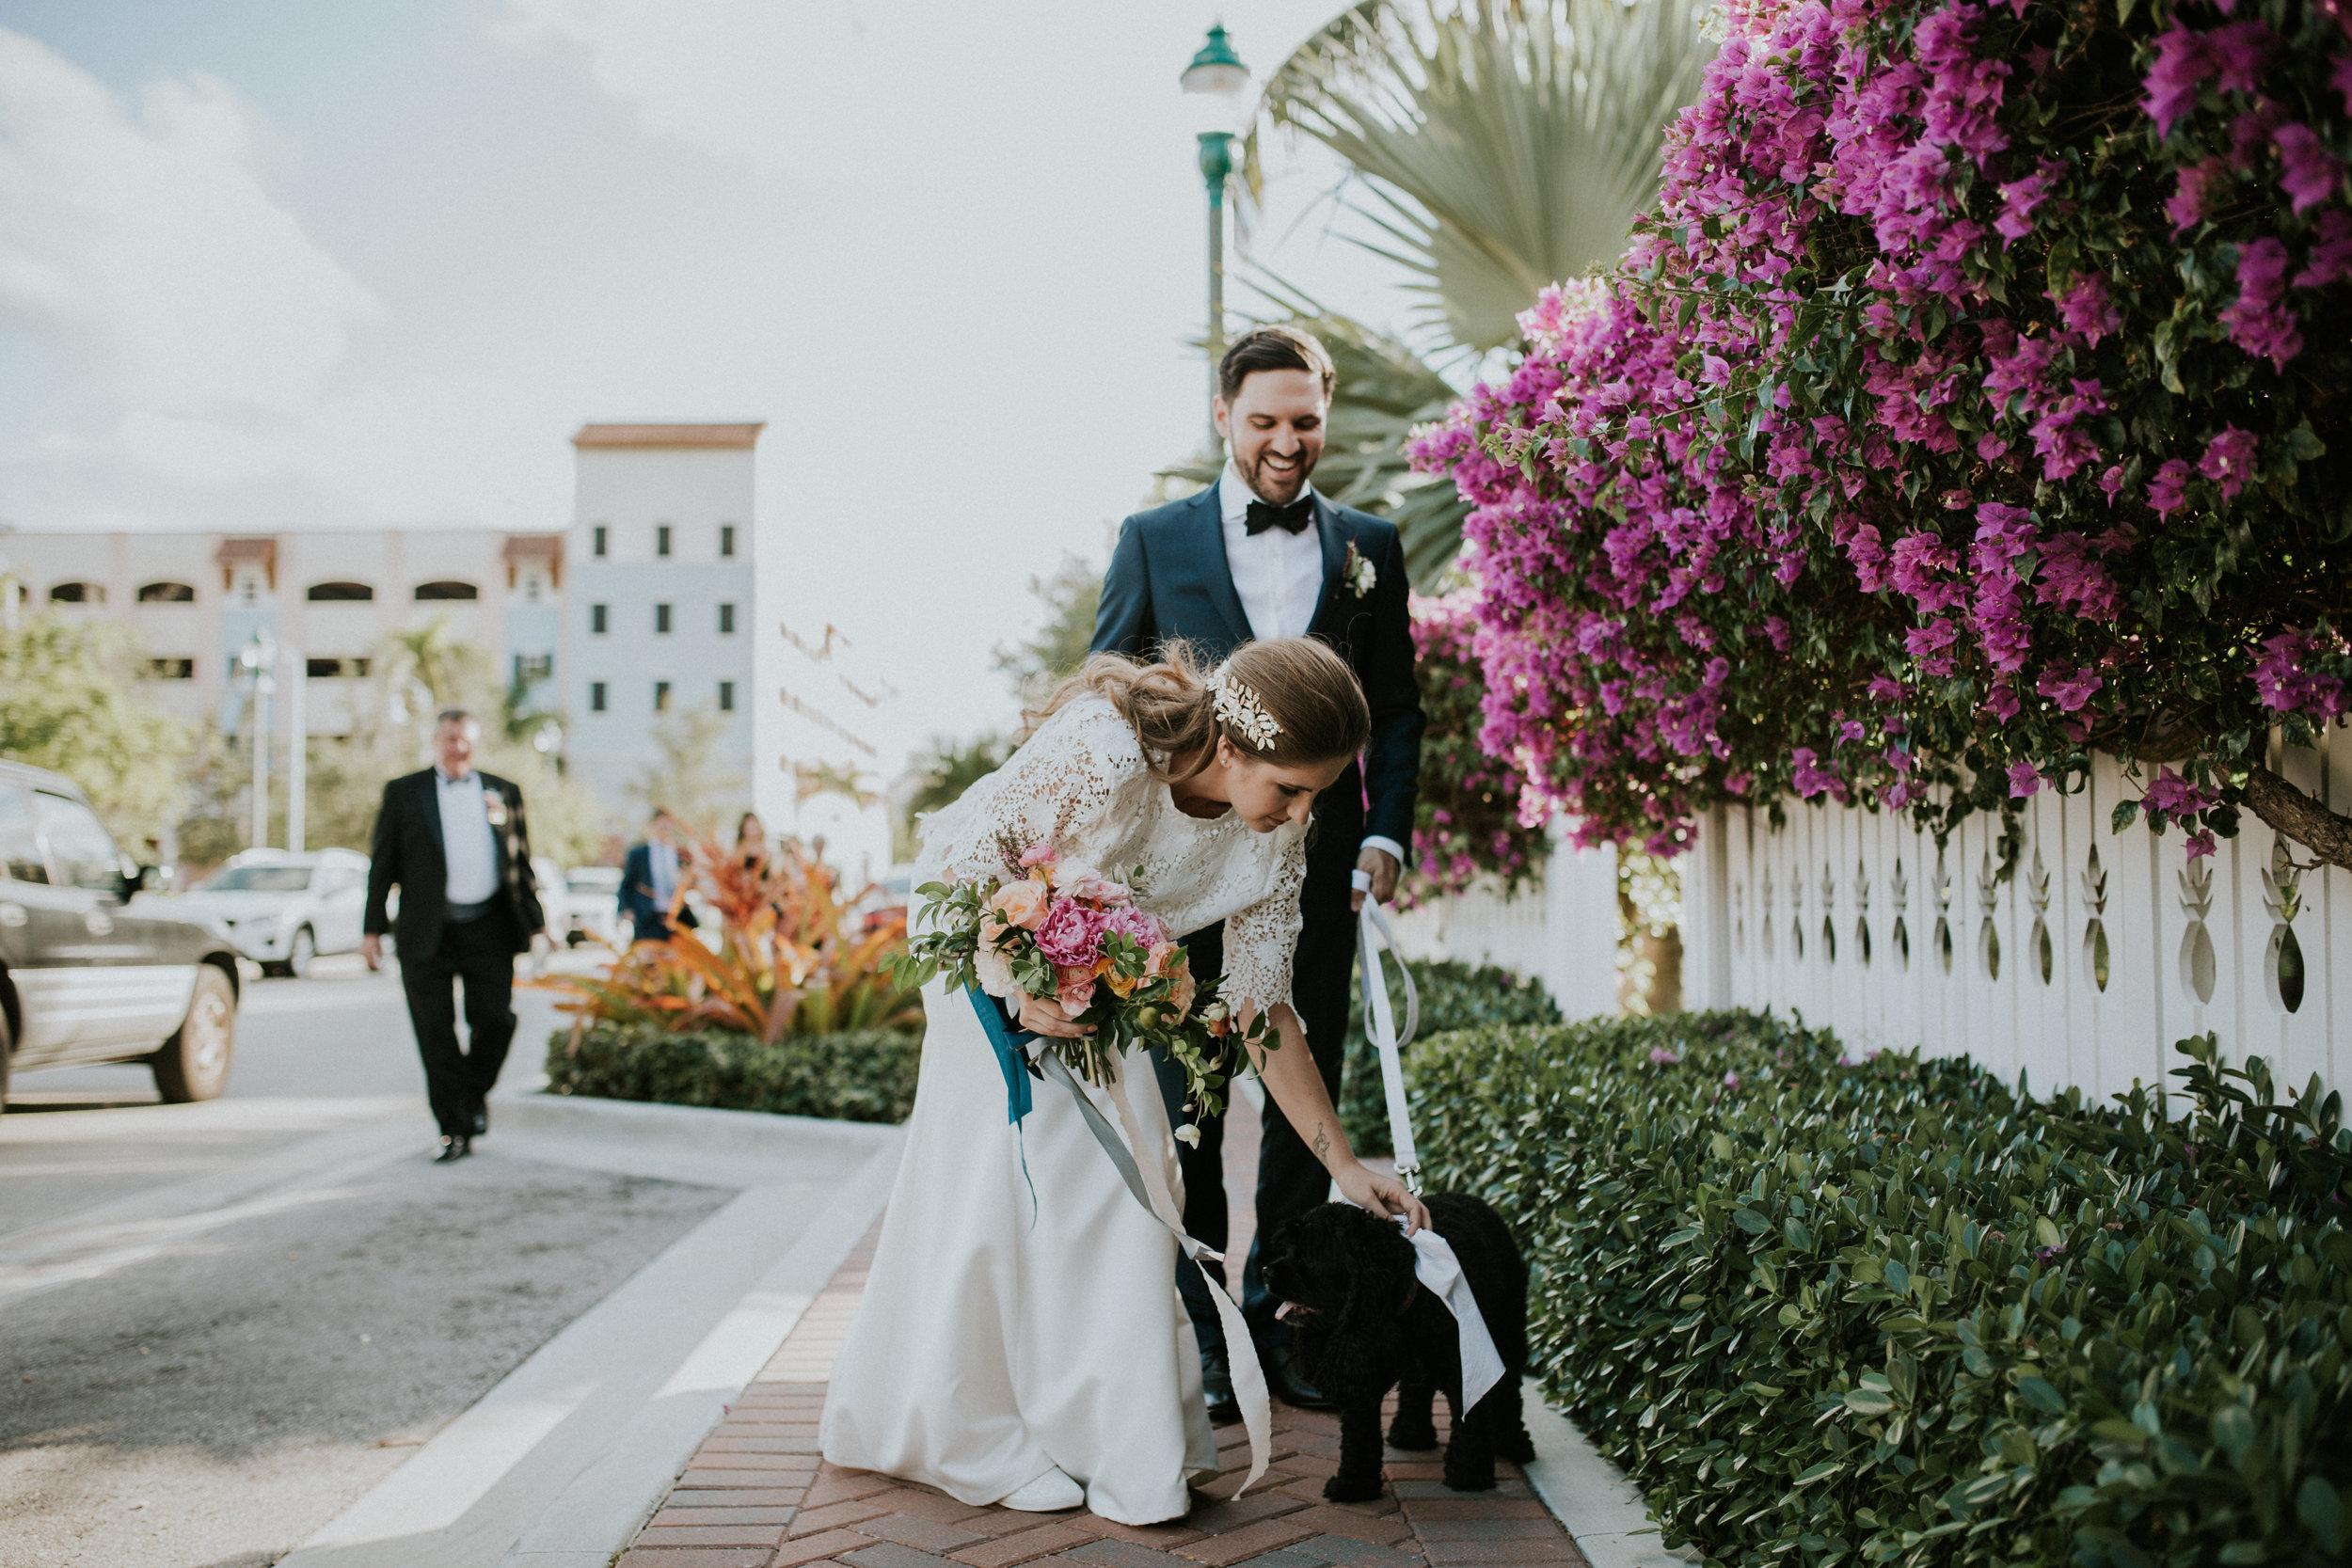 Downtown-delray-beach-wedding.jpg